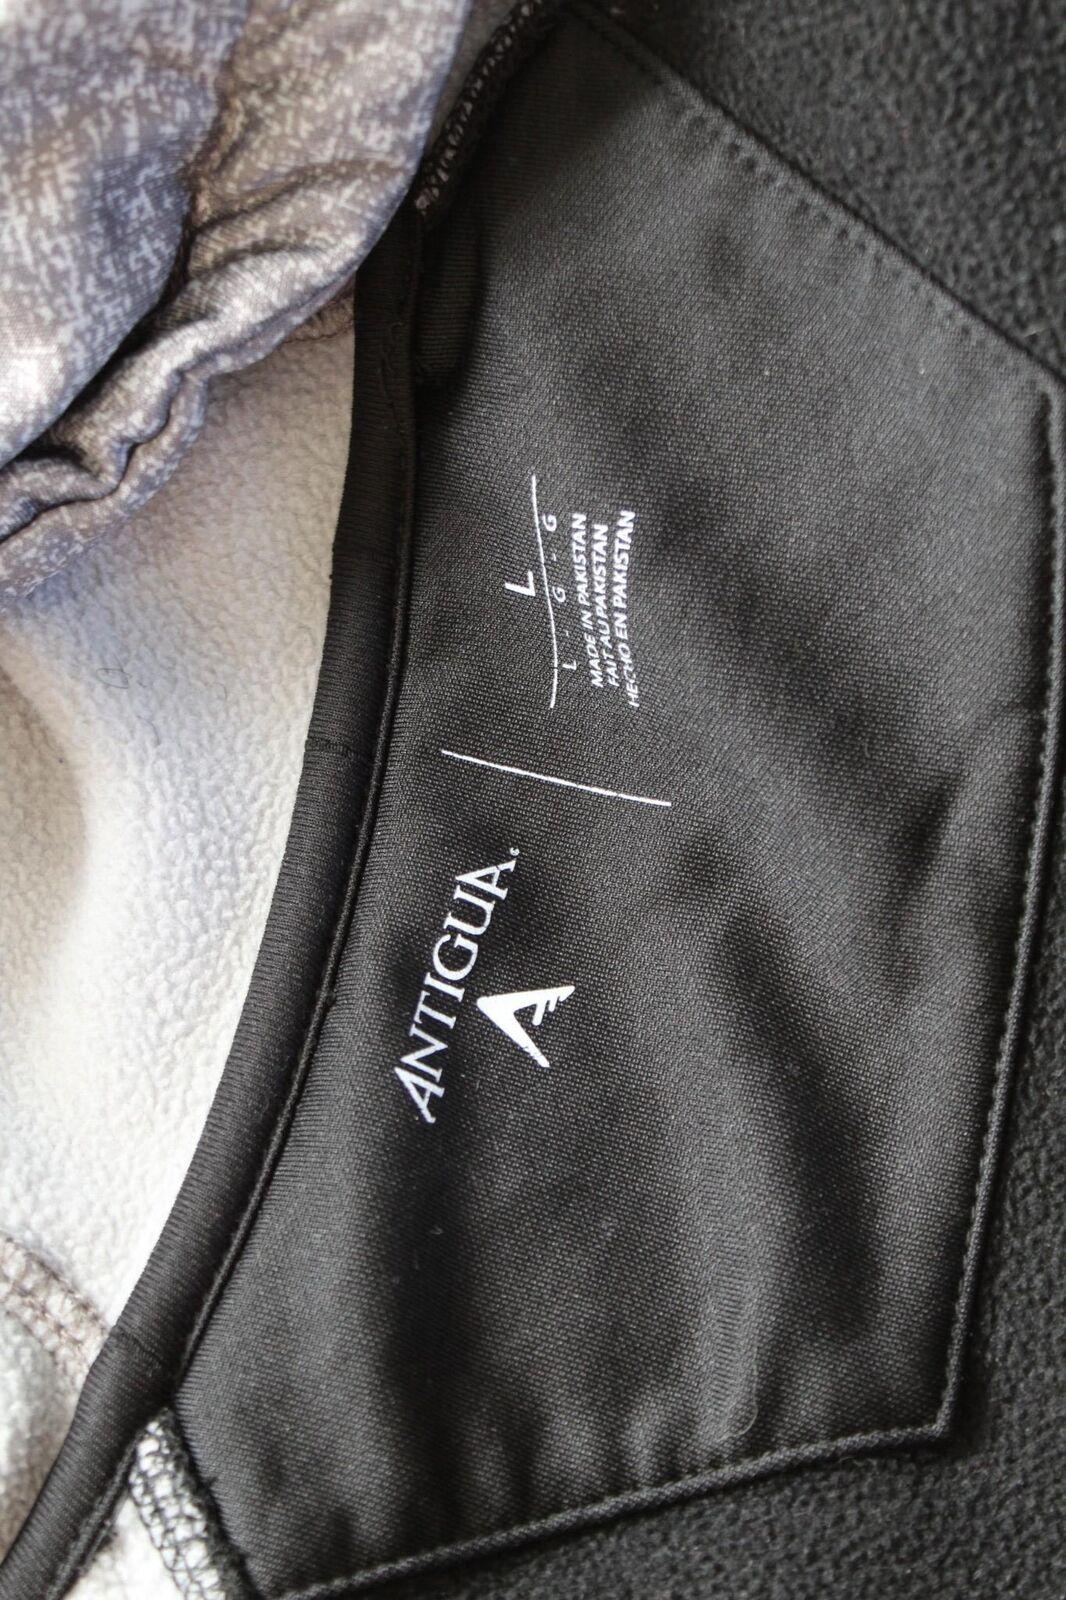 Carolina Panthers Gray Black Printed Zip Front Ho… - image 4